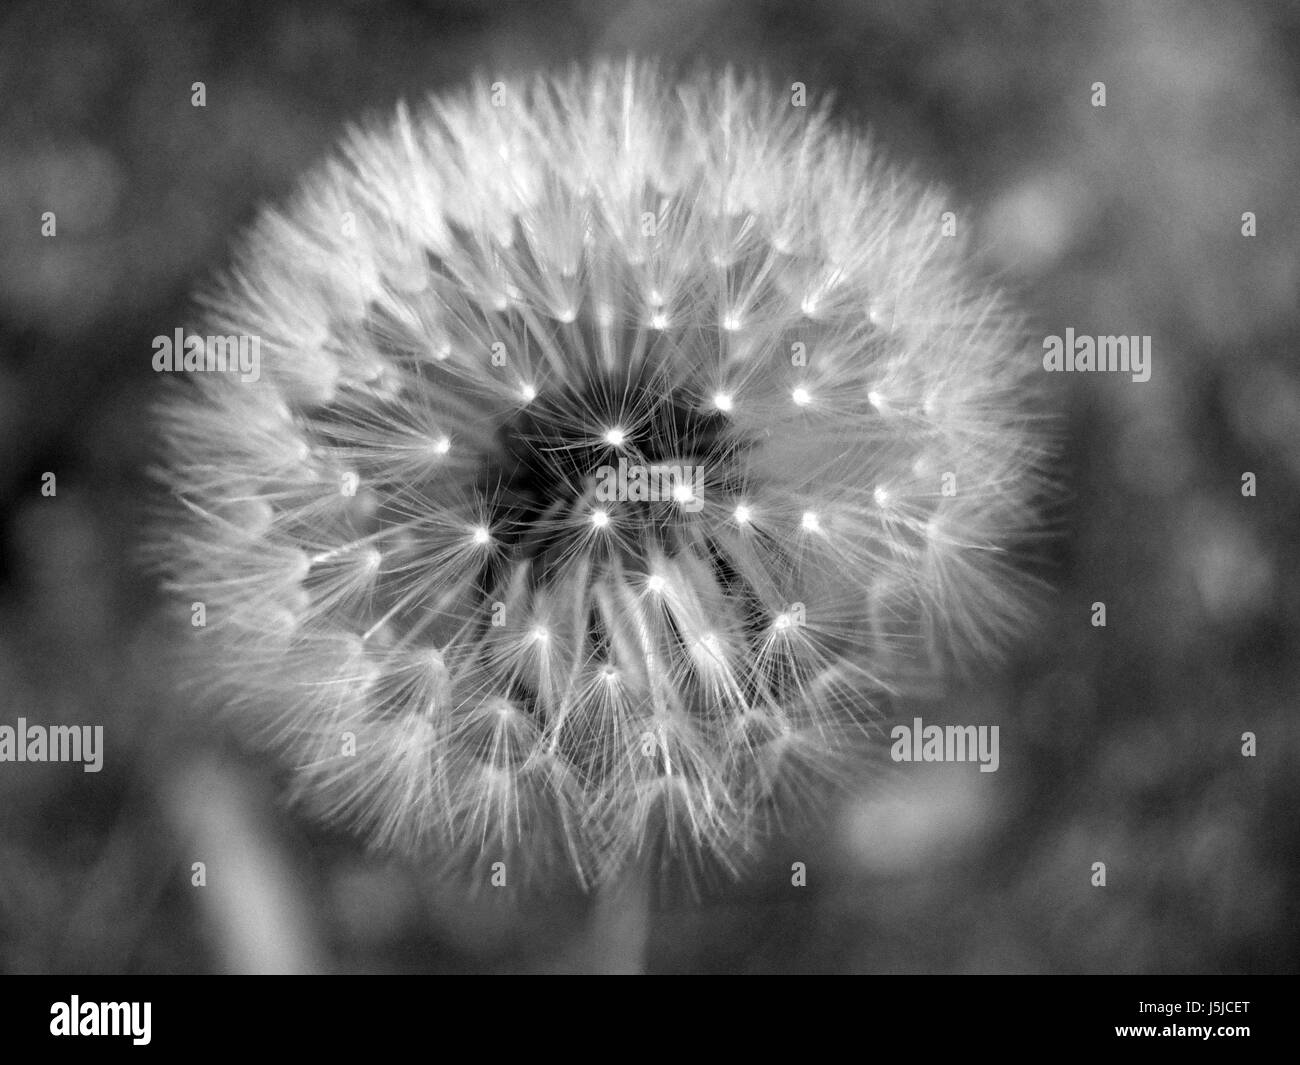 dandelion clock on a dark background - Stock Image